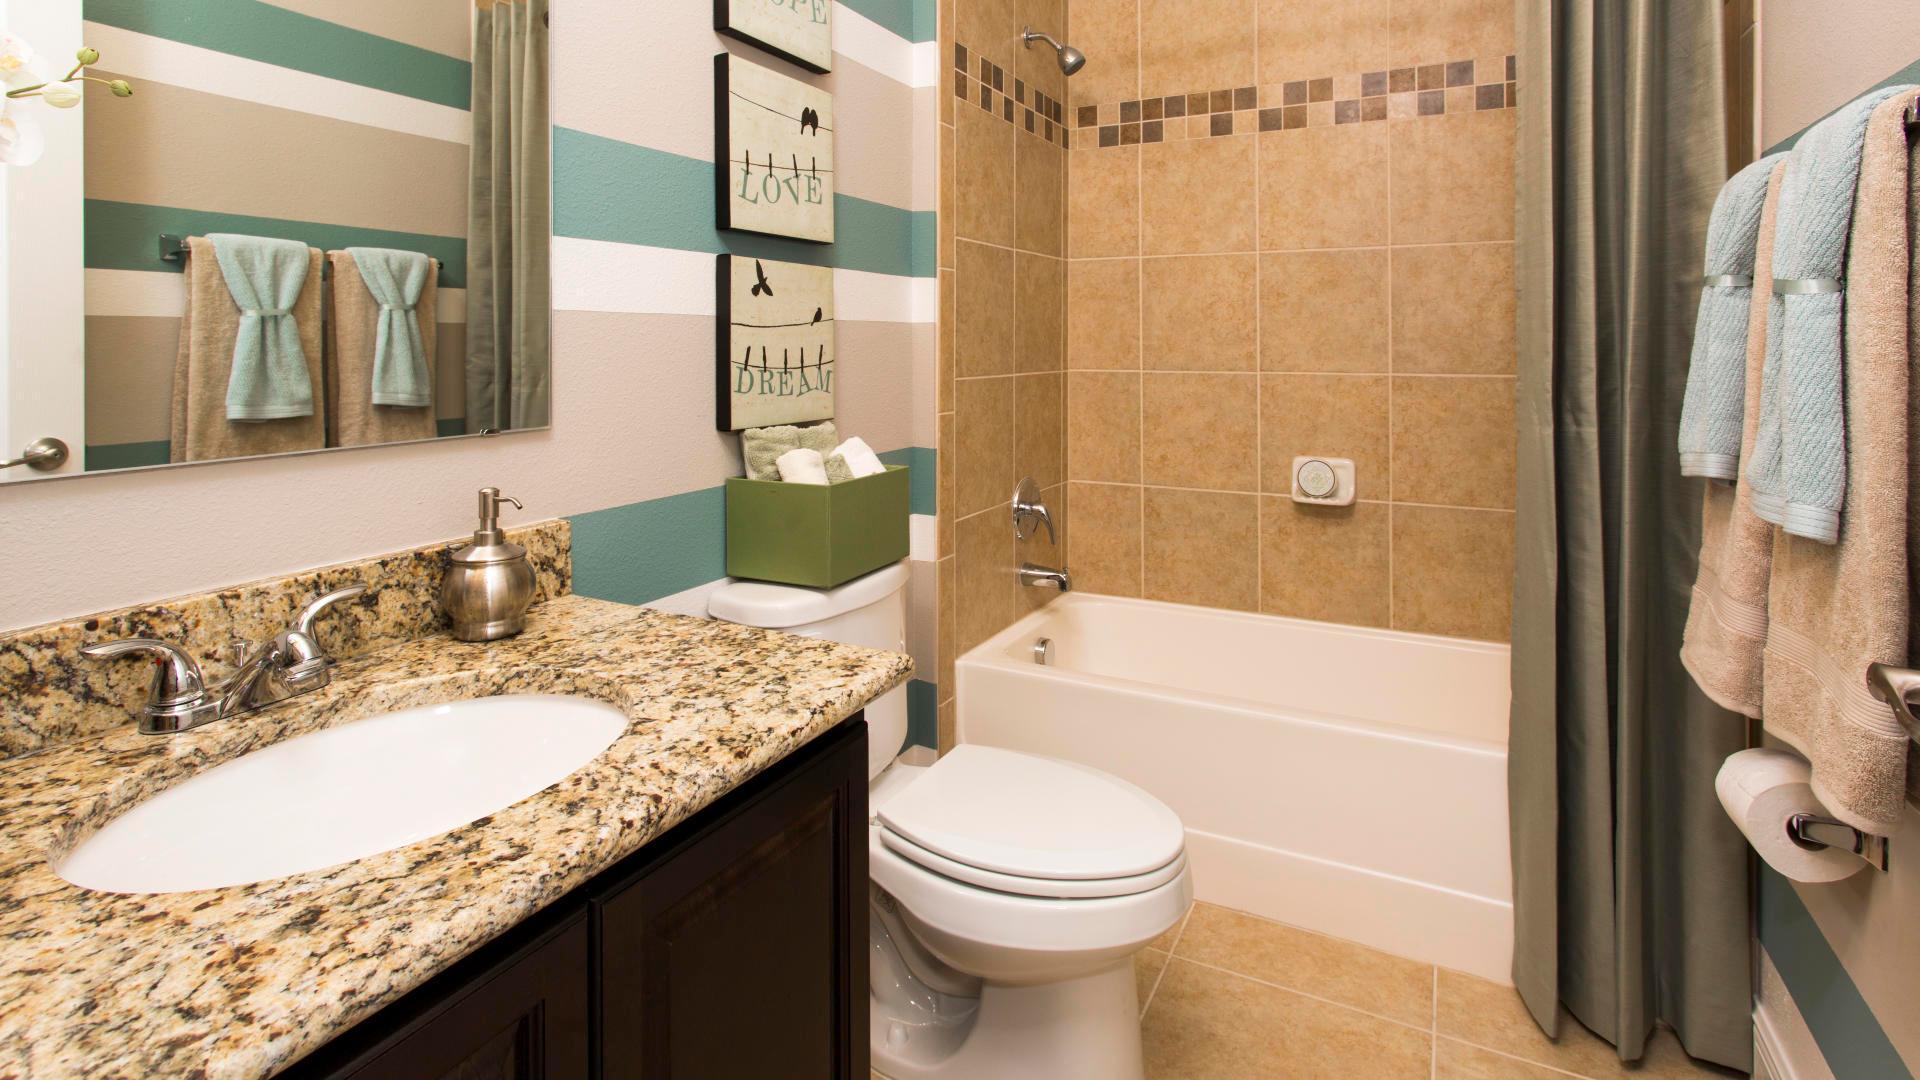 Bathroom featured in the Drexel By Maronda Homes in Daytona Beach, FL